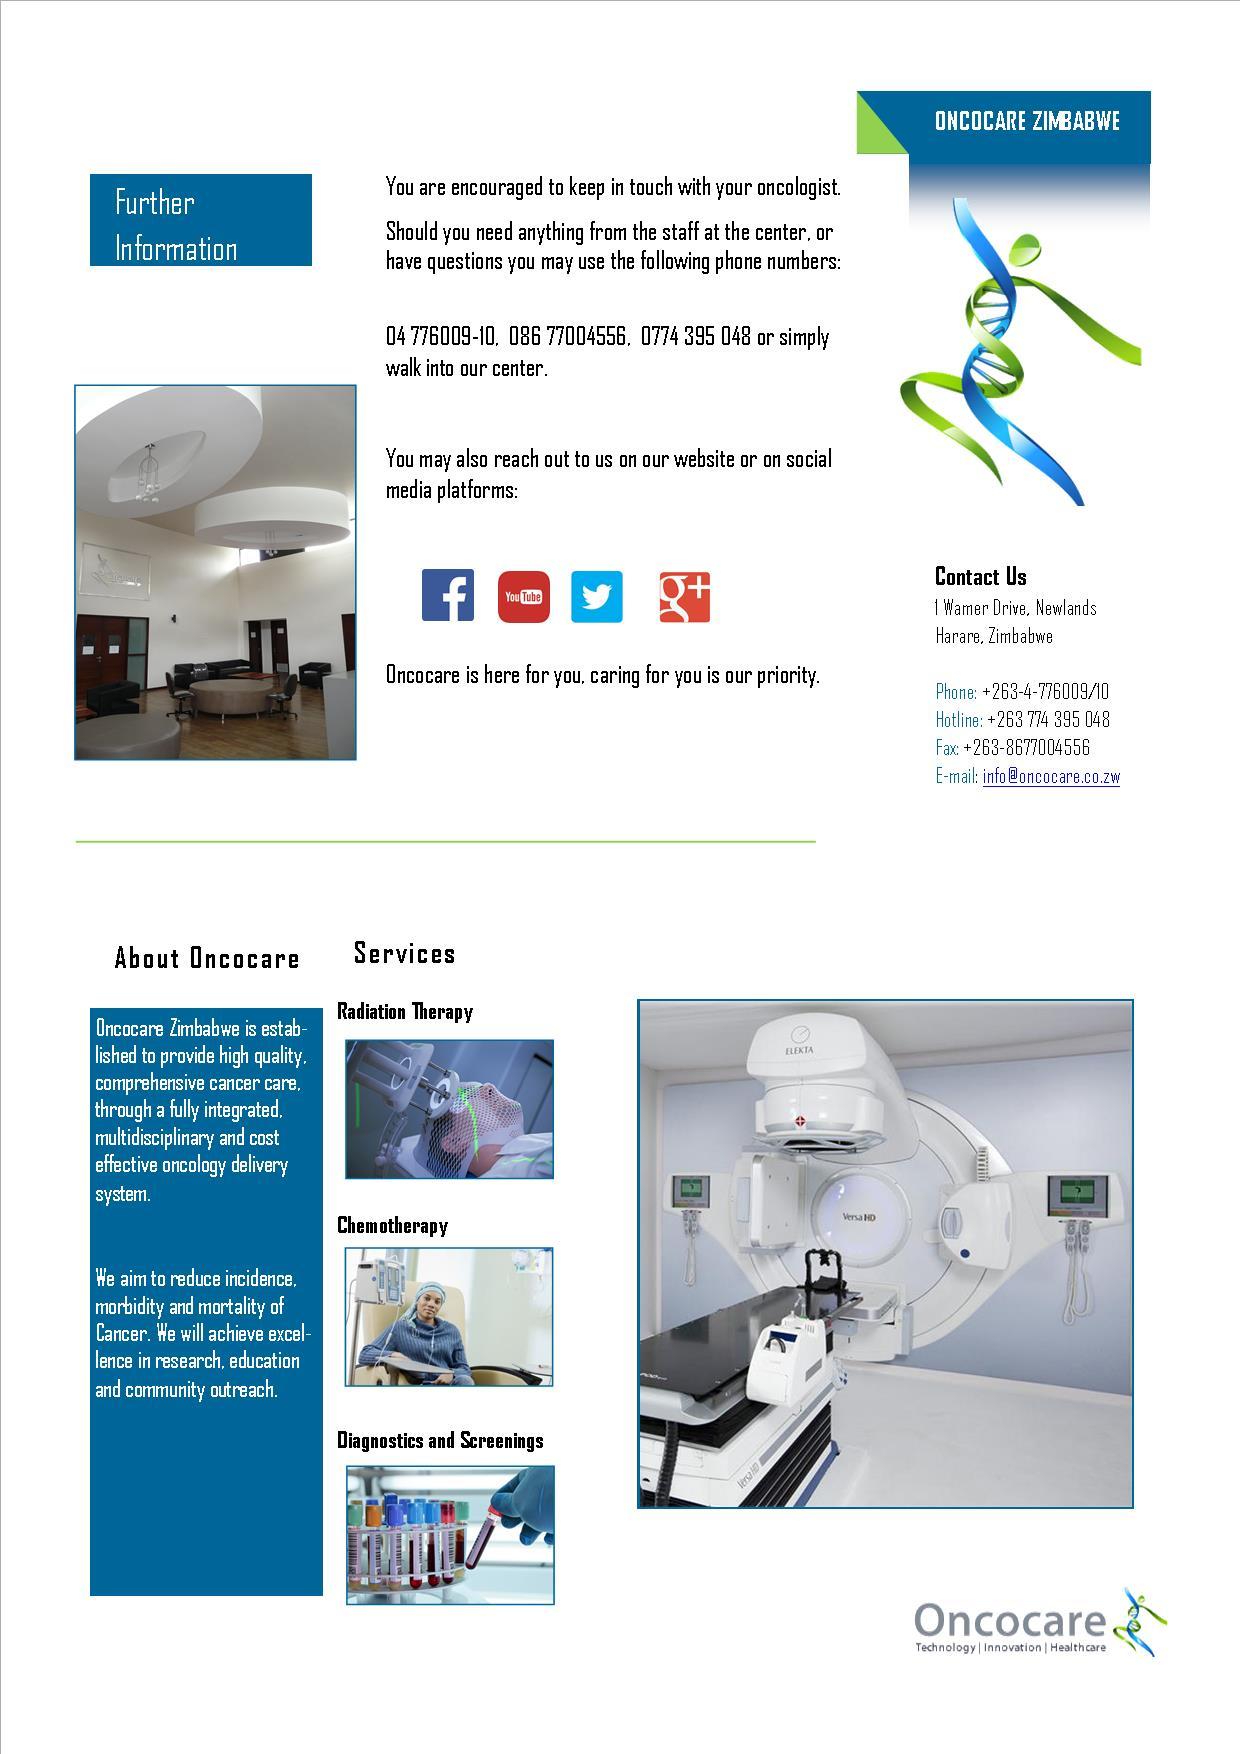 patient-information-sheet-2-6